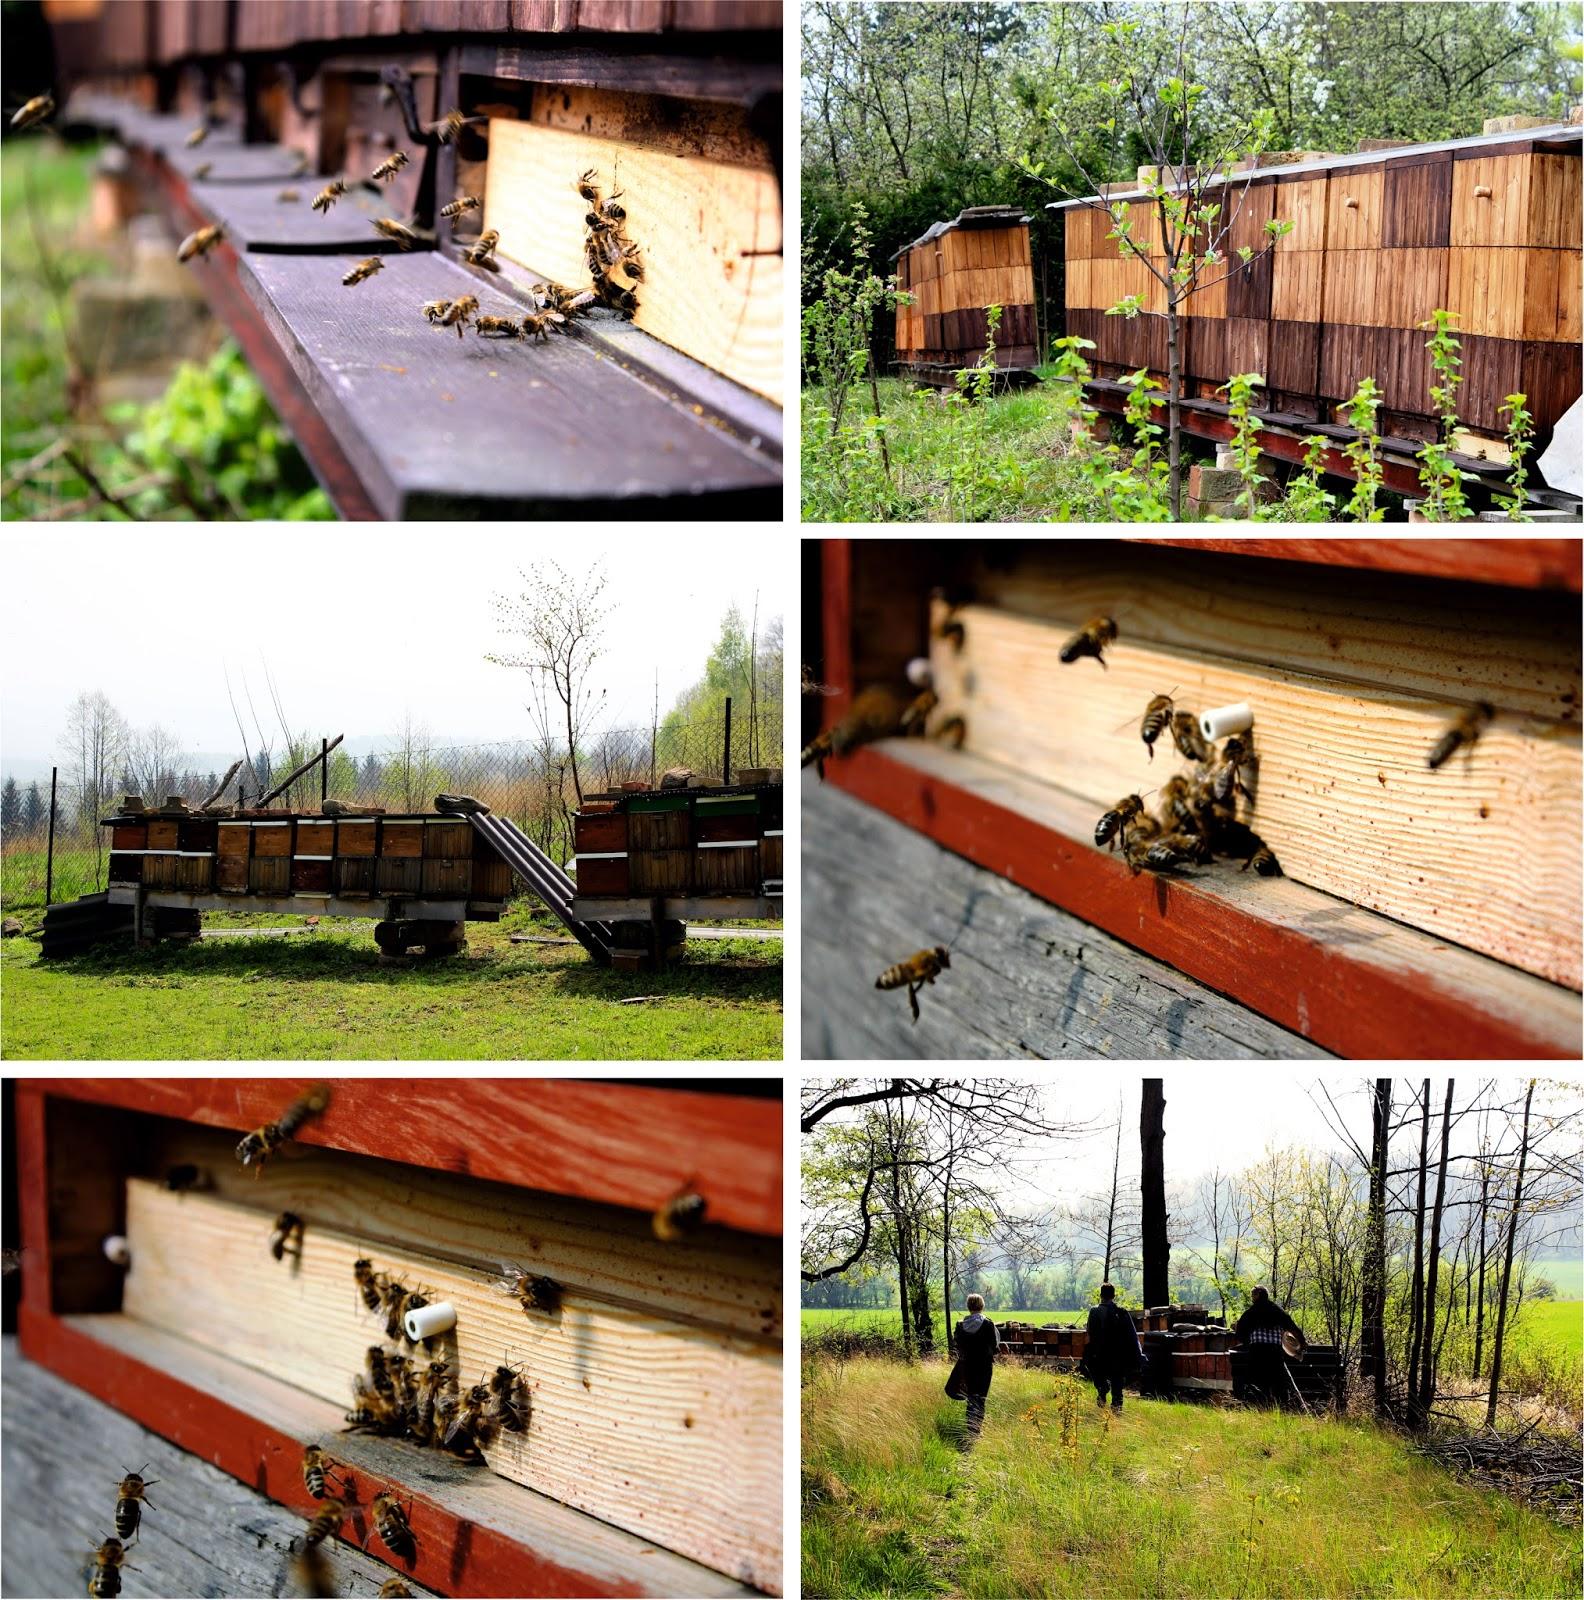 Včelí úl, zdroj medu